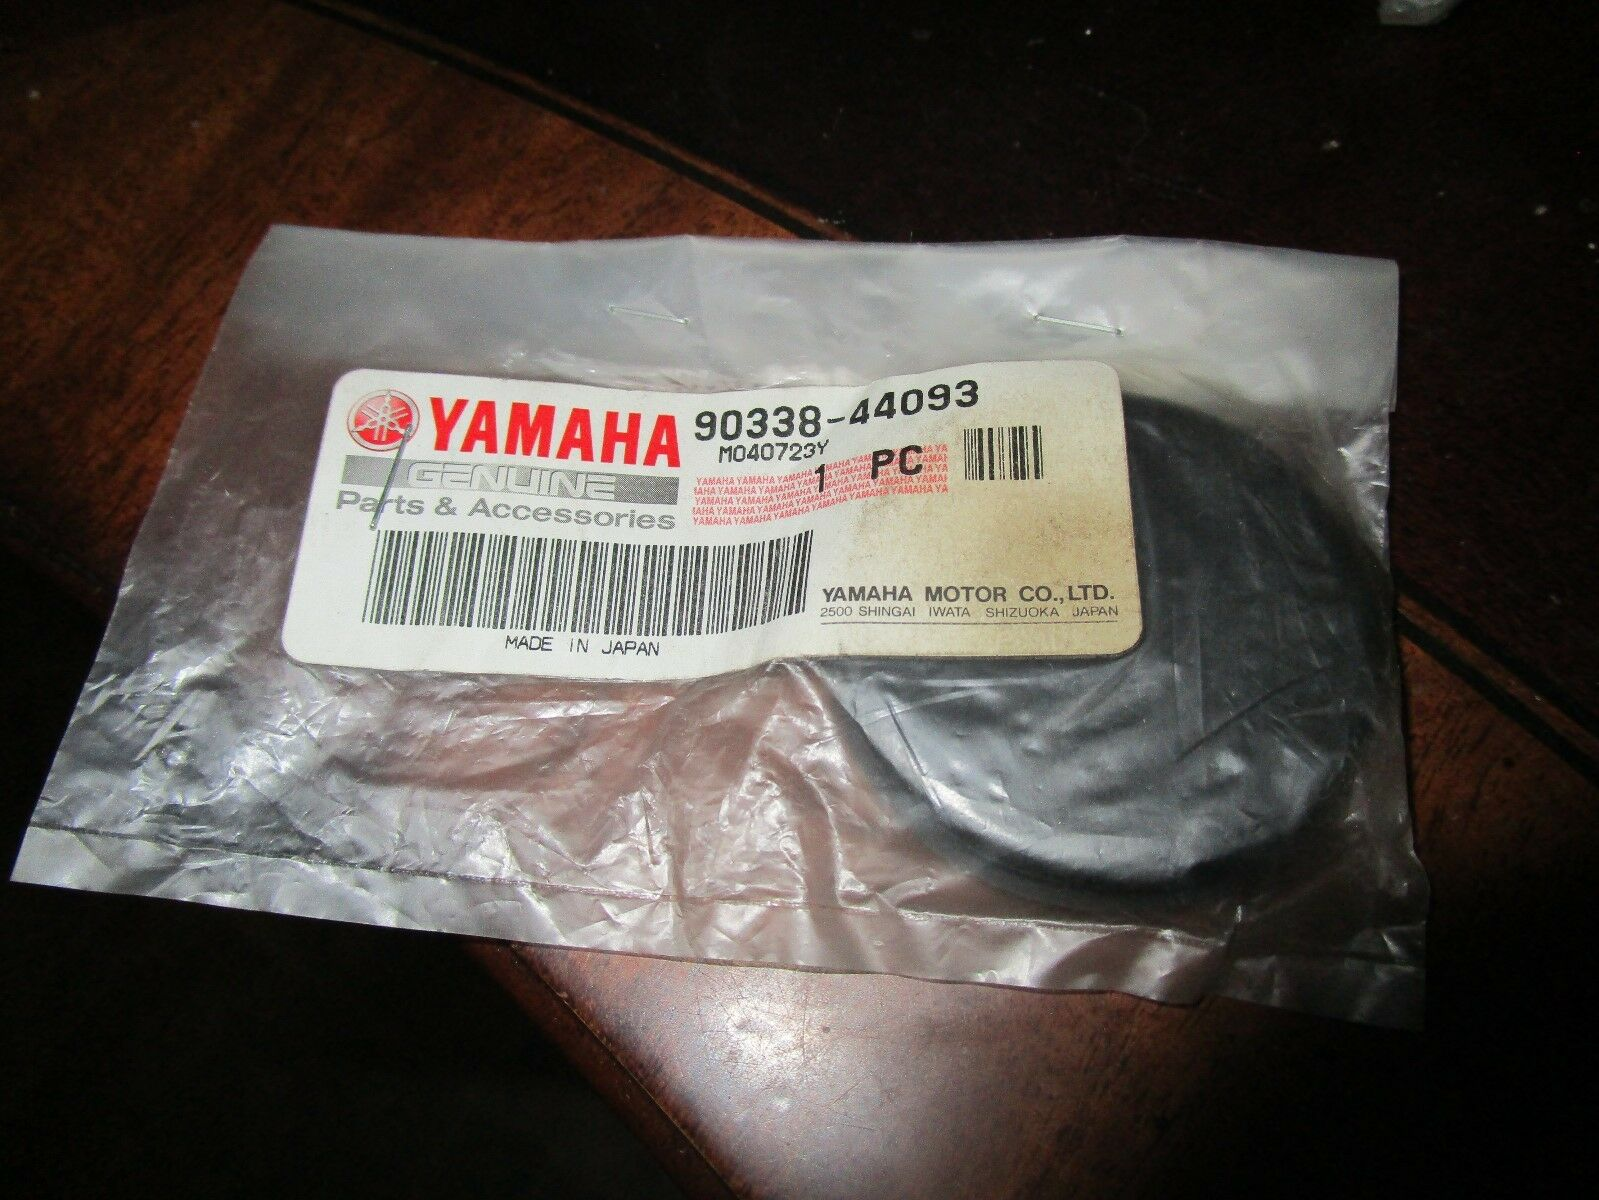 YAMAHA CHAINCASE PLUG Tri-Moto CLUTCH ADJUSTER PLUG SRX SX Phazer  90338-44093